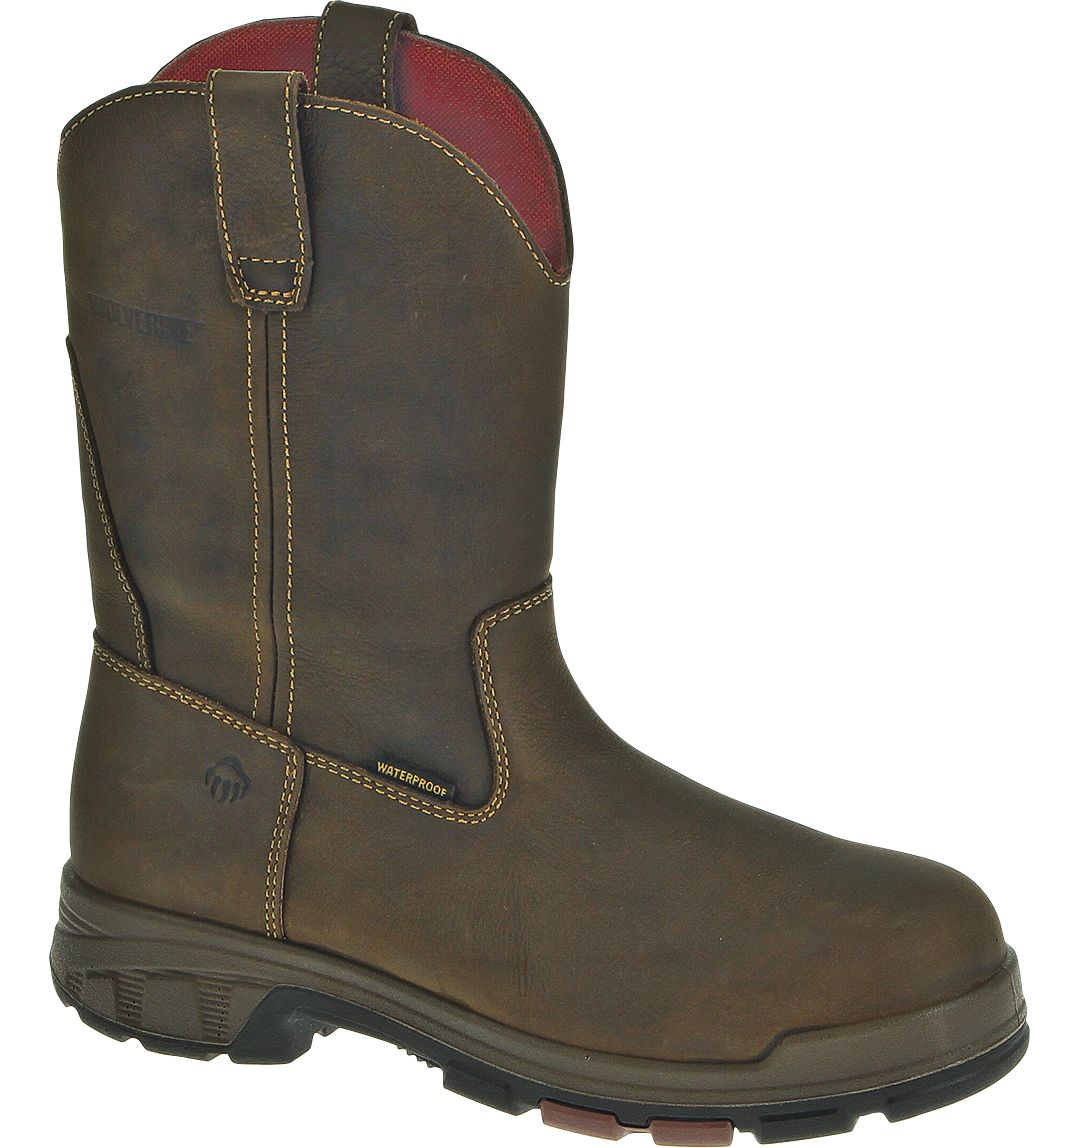 f68c69721ed Wolverine Men's Cabor Wellington Waterproof Composite Toe Work Boots